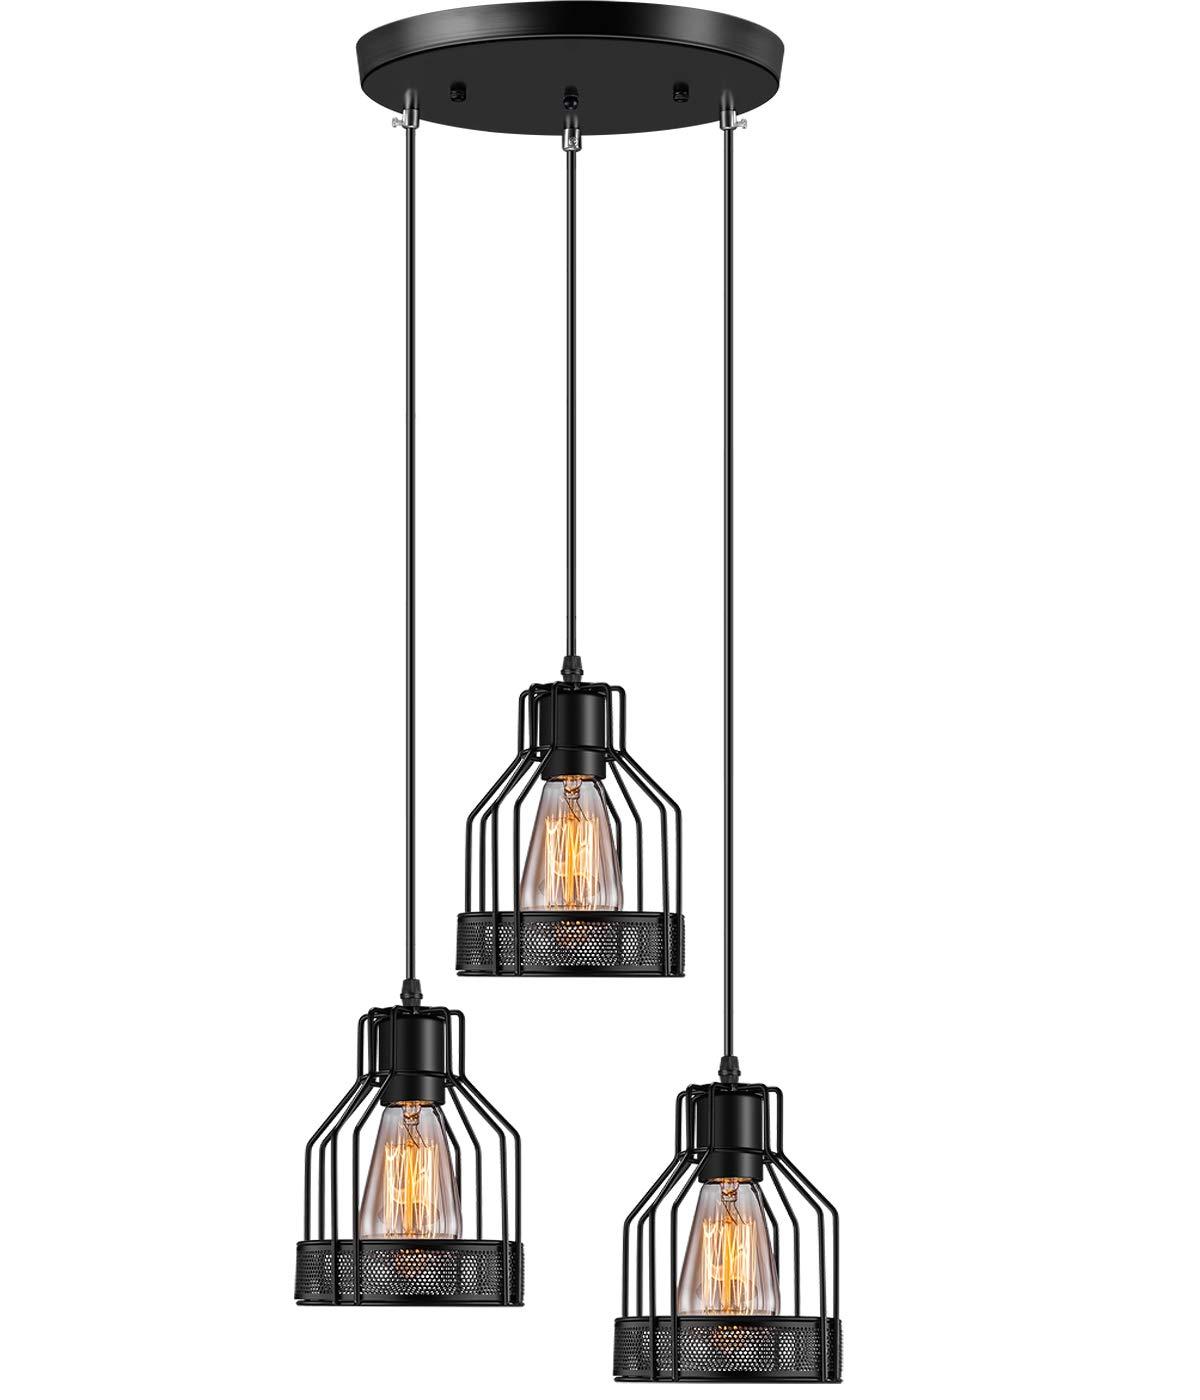 Industrial Pendant Lighting Licperron 3 Lights